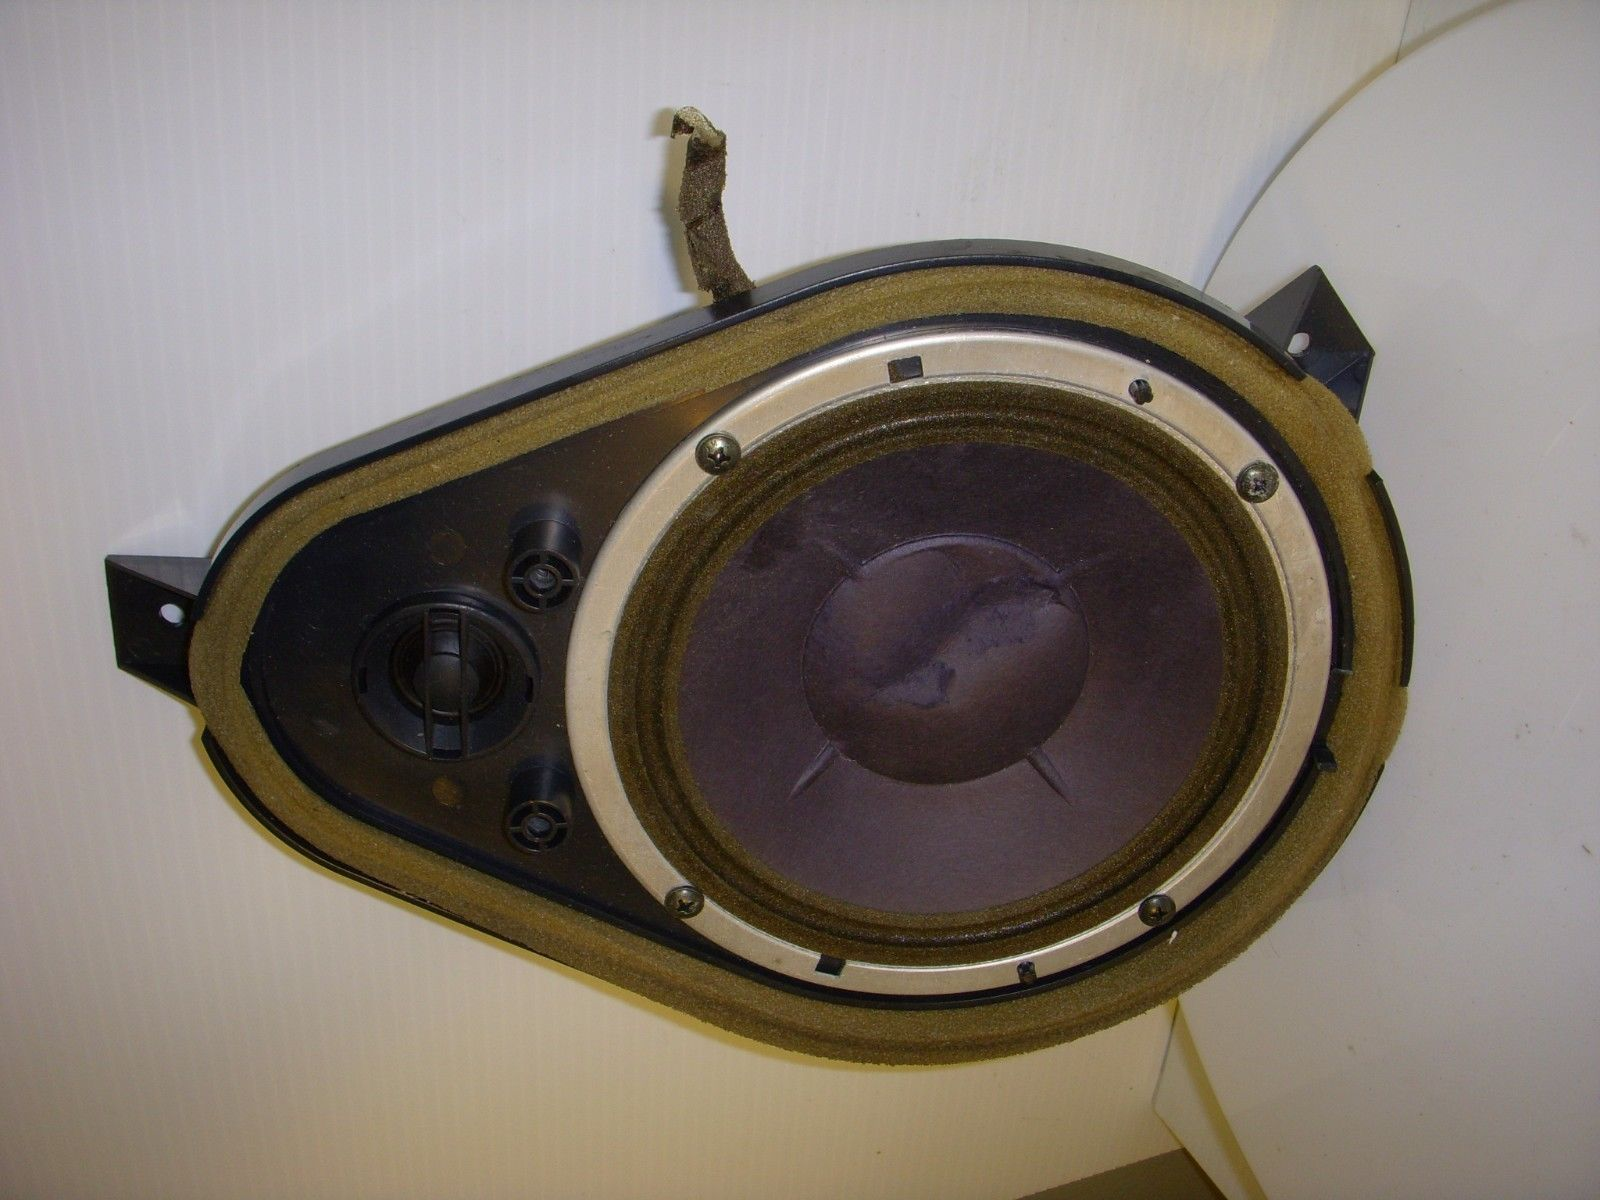 Volkswagen VW CABRIO 1999 Speaker w/ Mount Rear Driver OEM